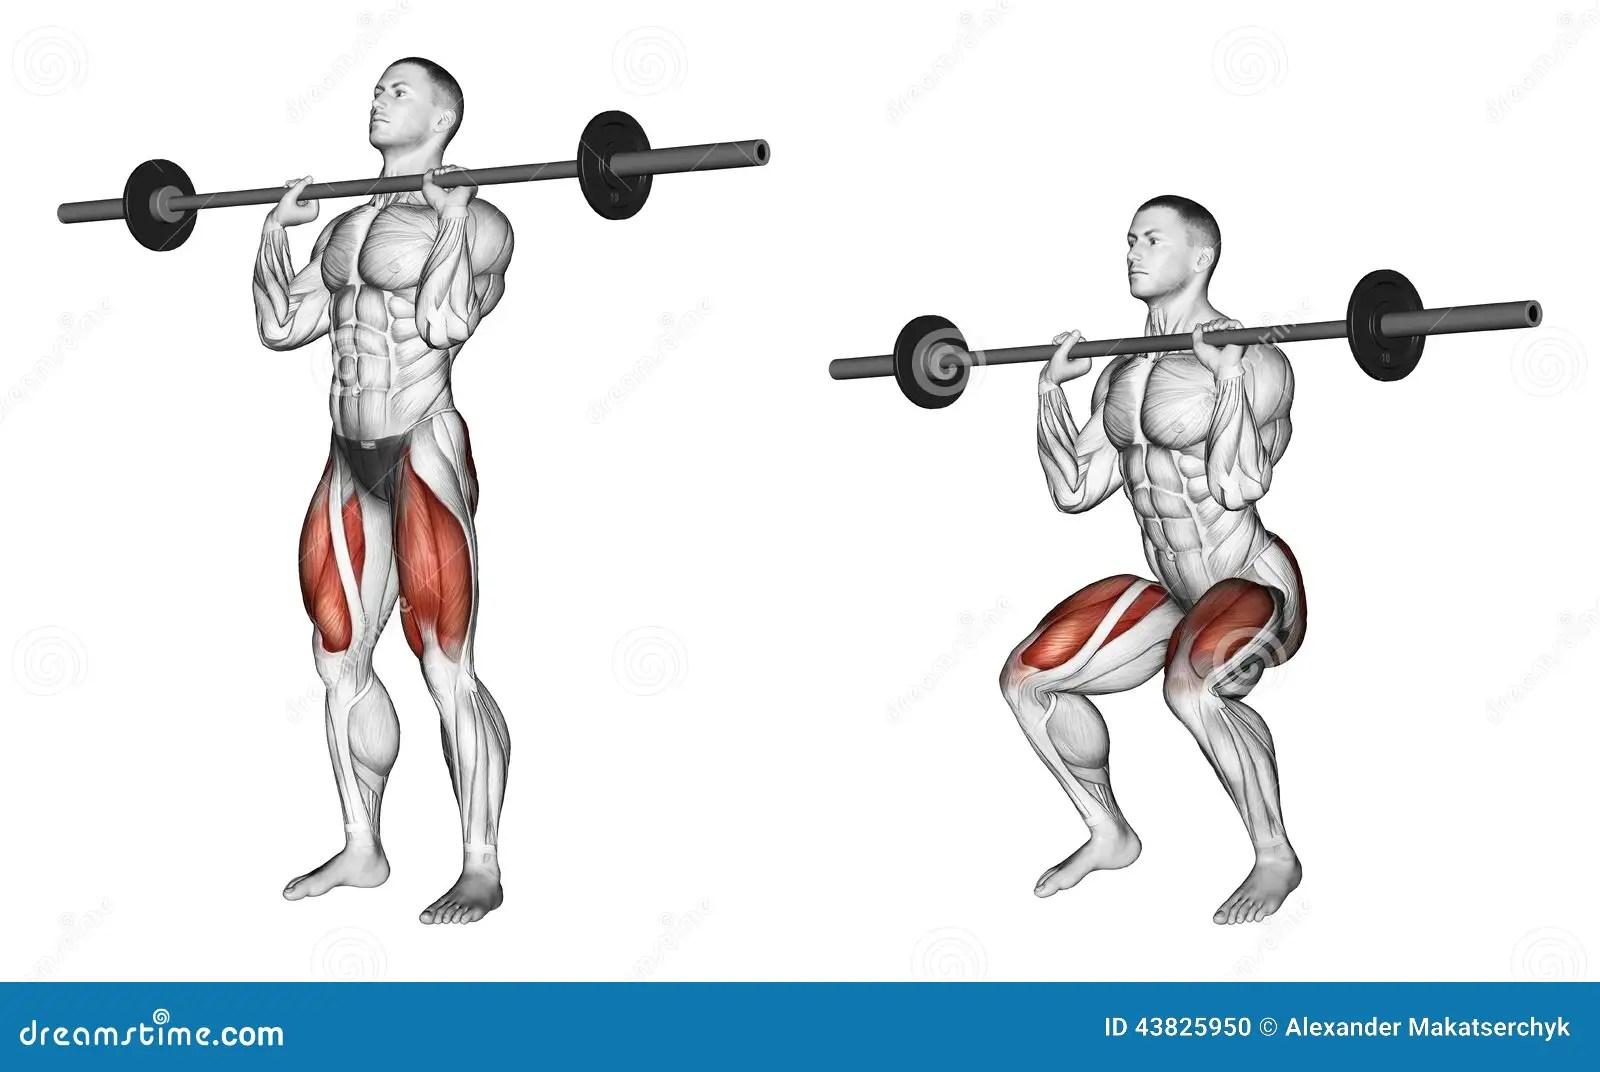 Bodybuilding Chest Exercises For Men Images